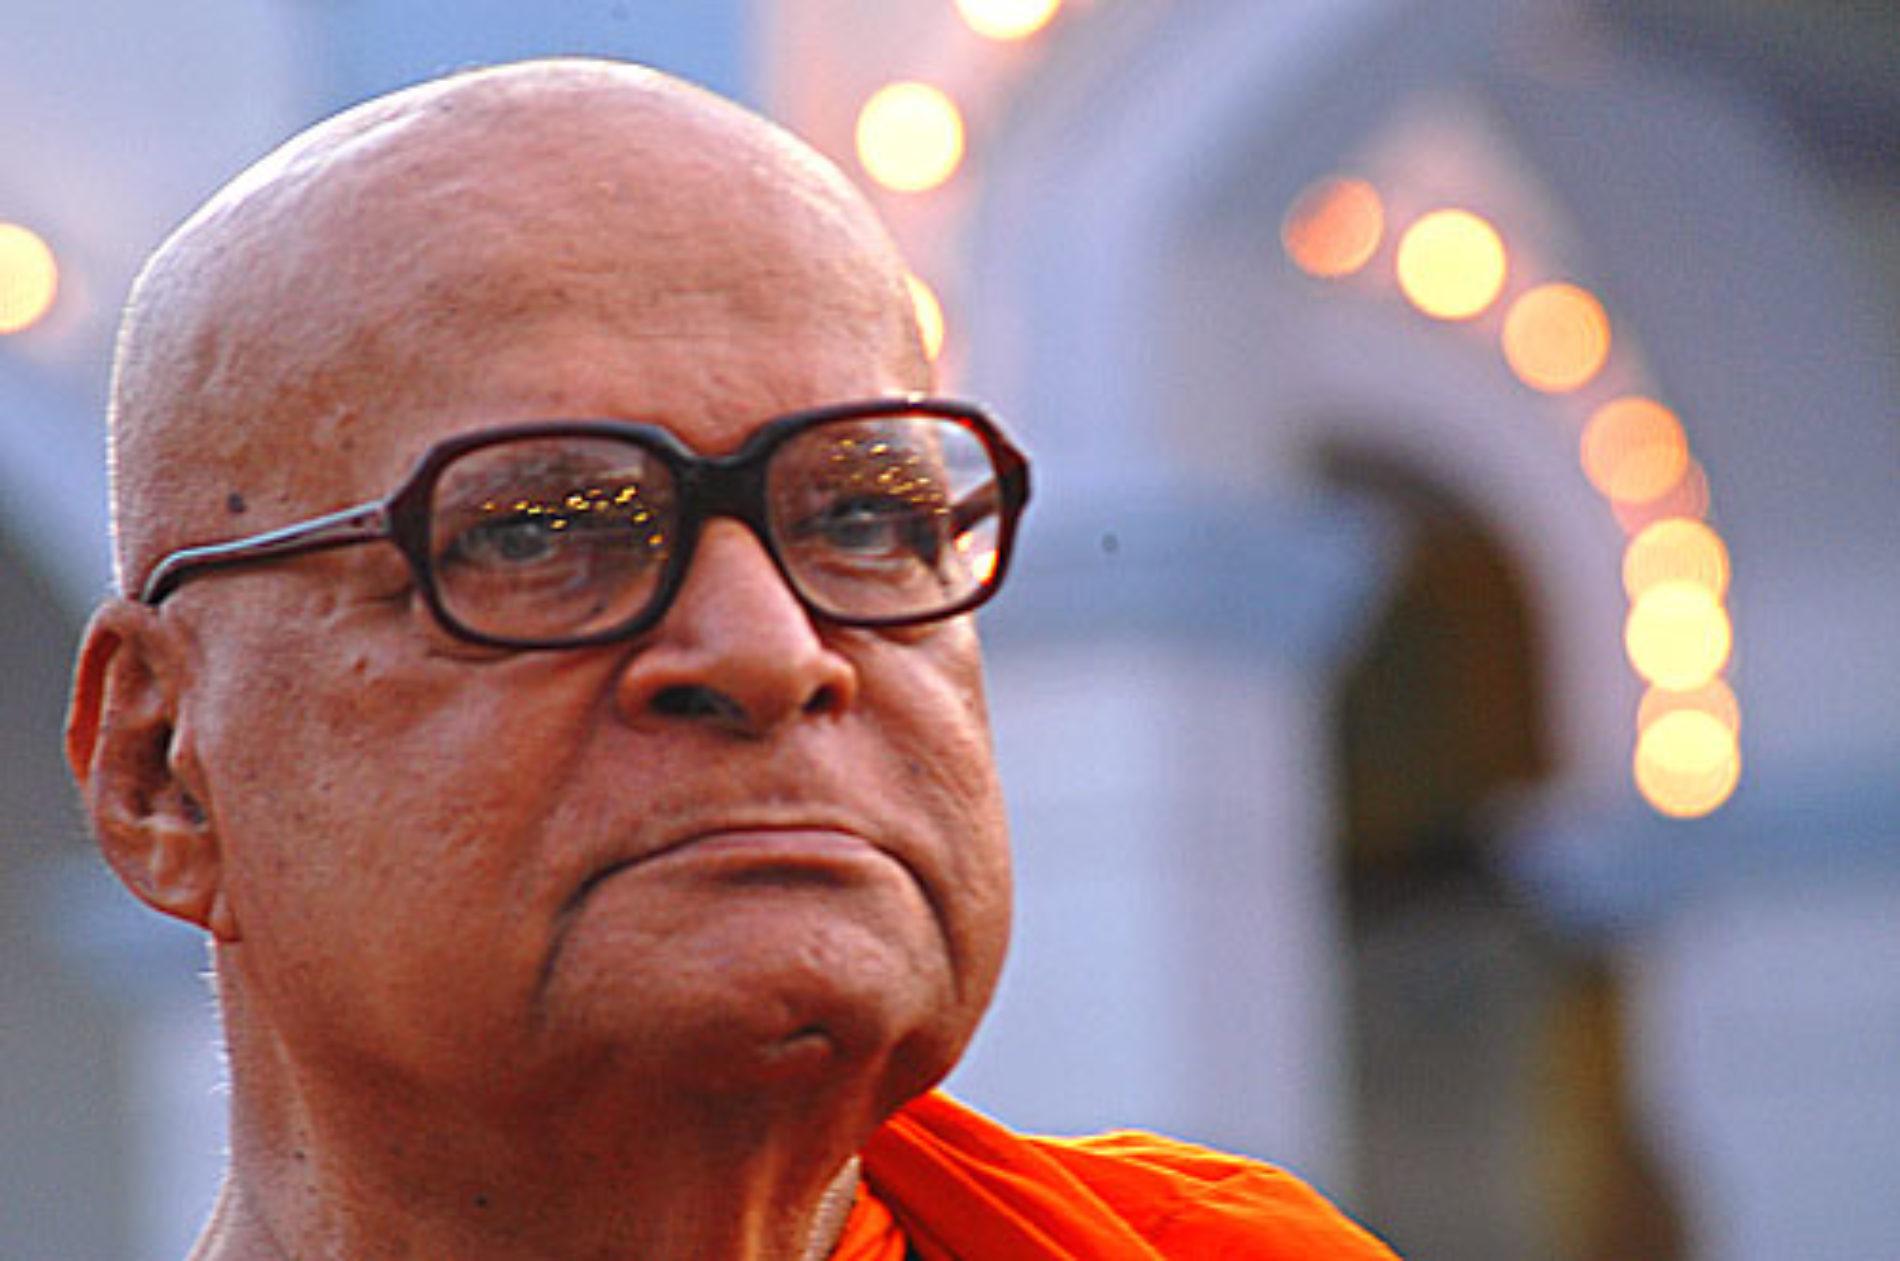 О привязанностях и их последствиях —  Шри Дхаммананда